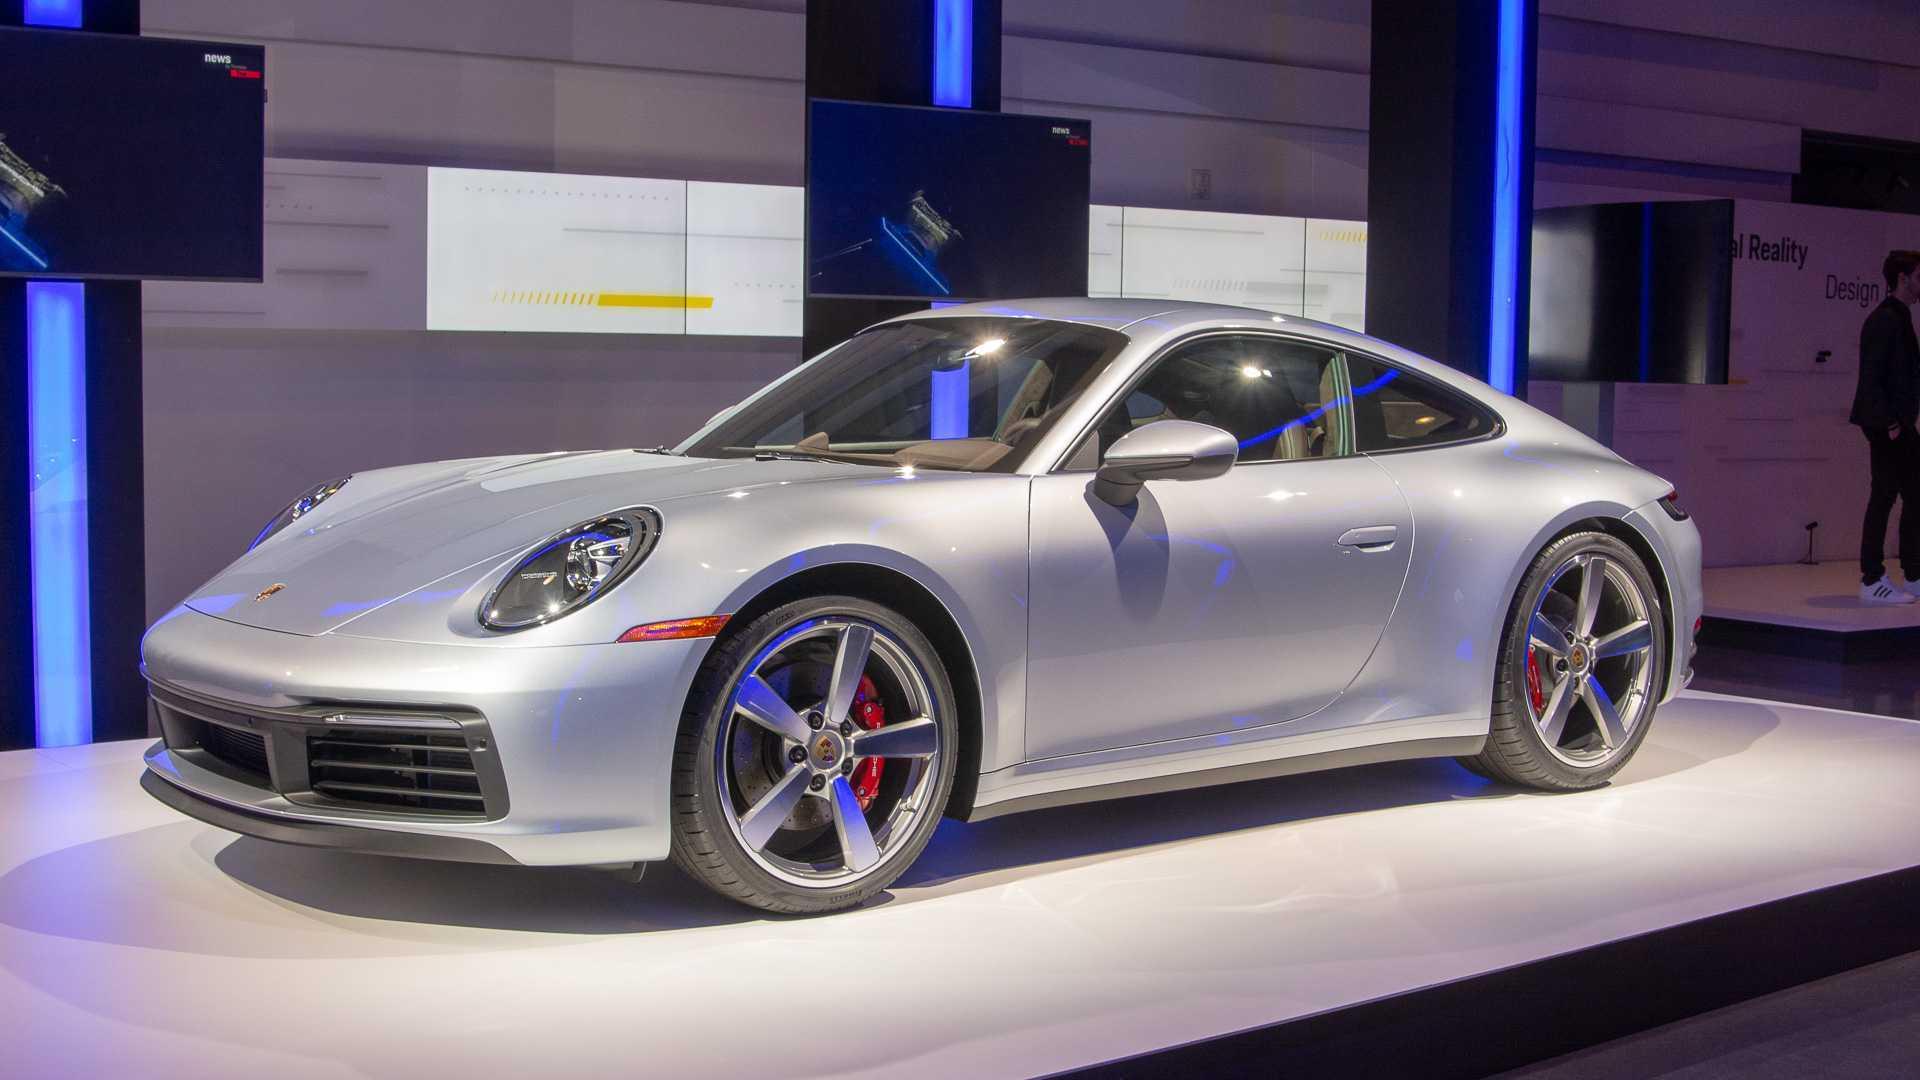 2020 Porsche 911 Carrera S, Carrera 4S Debut With 443 HP